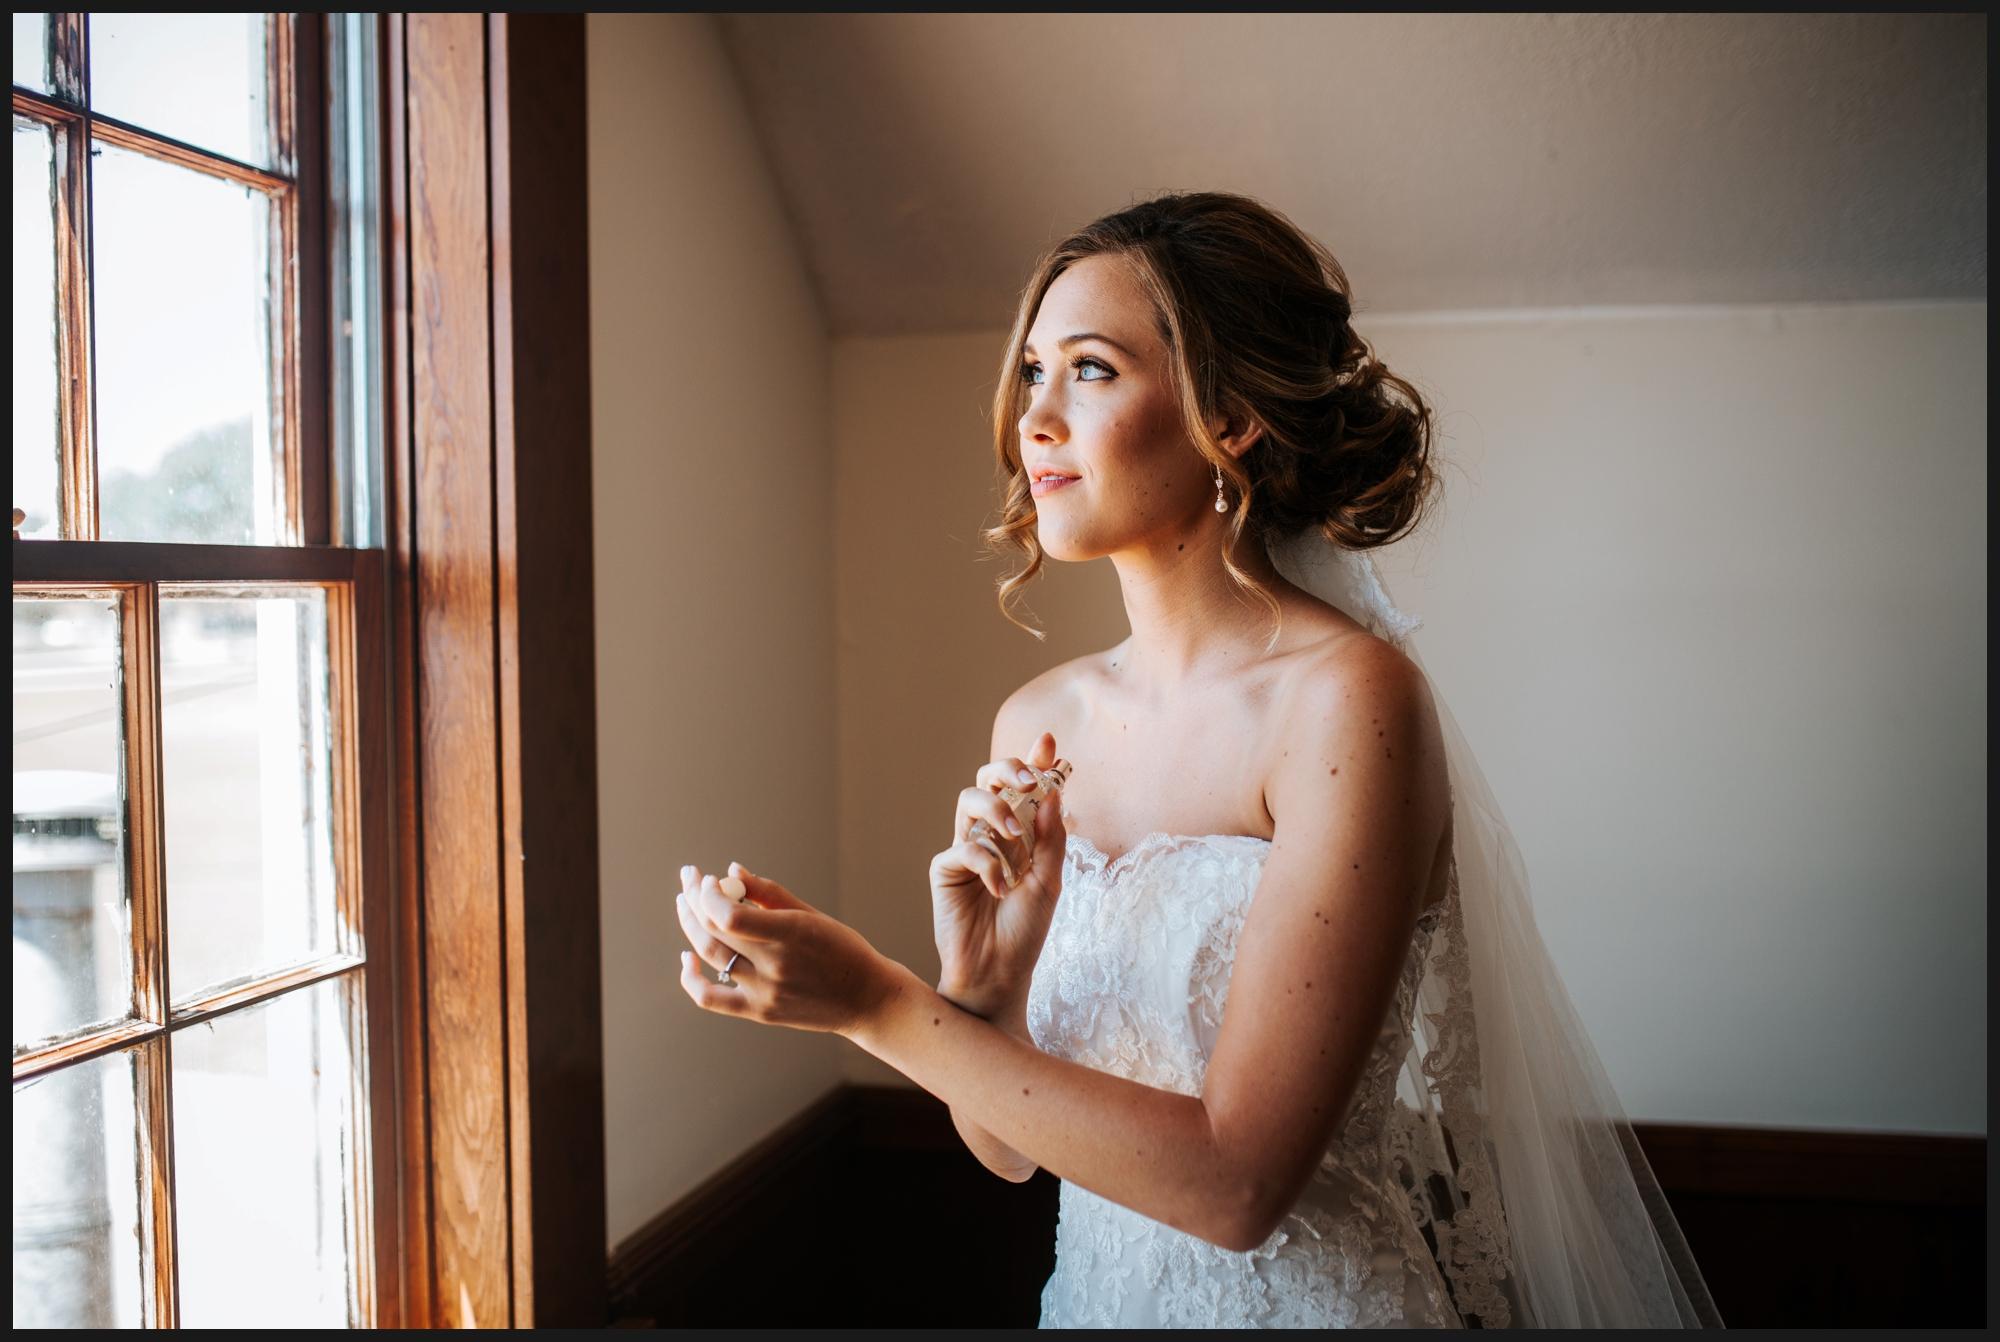 Orlando-Wedding-Photographer-destination-wedding-photographer-florida-wedding-photographer-bohemian-wedding-photographer_0057.jpg